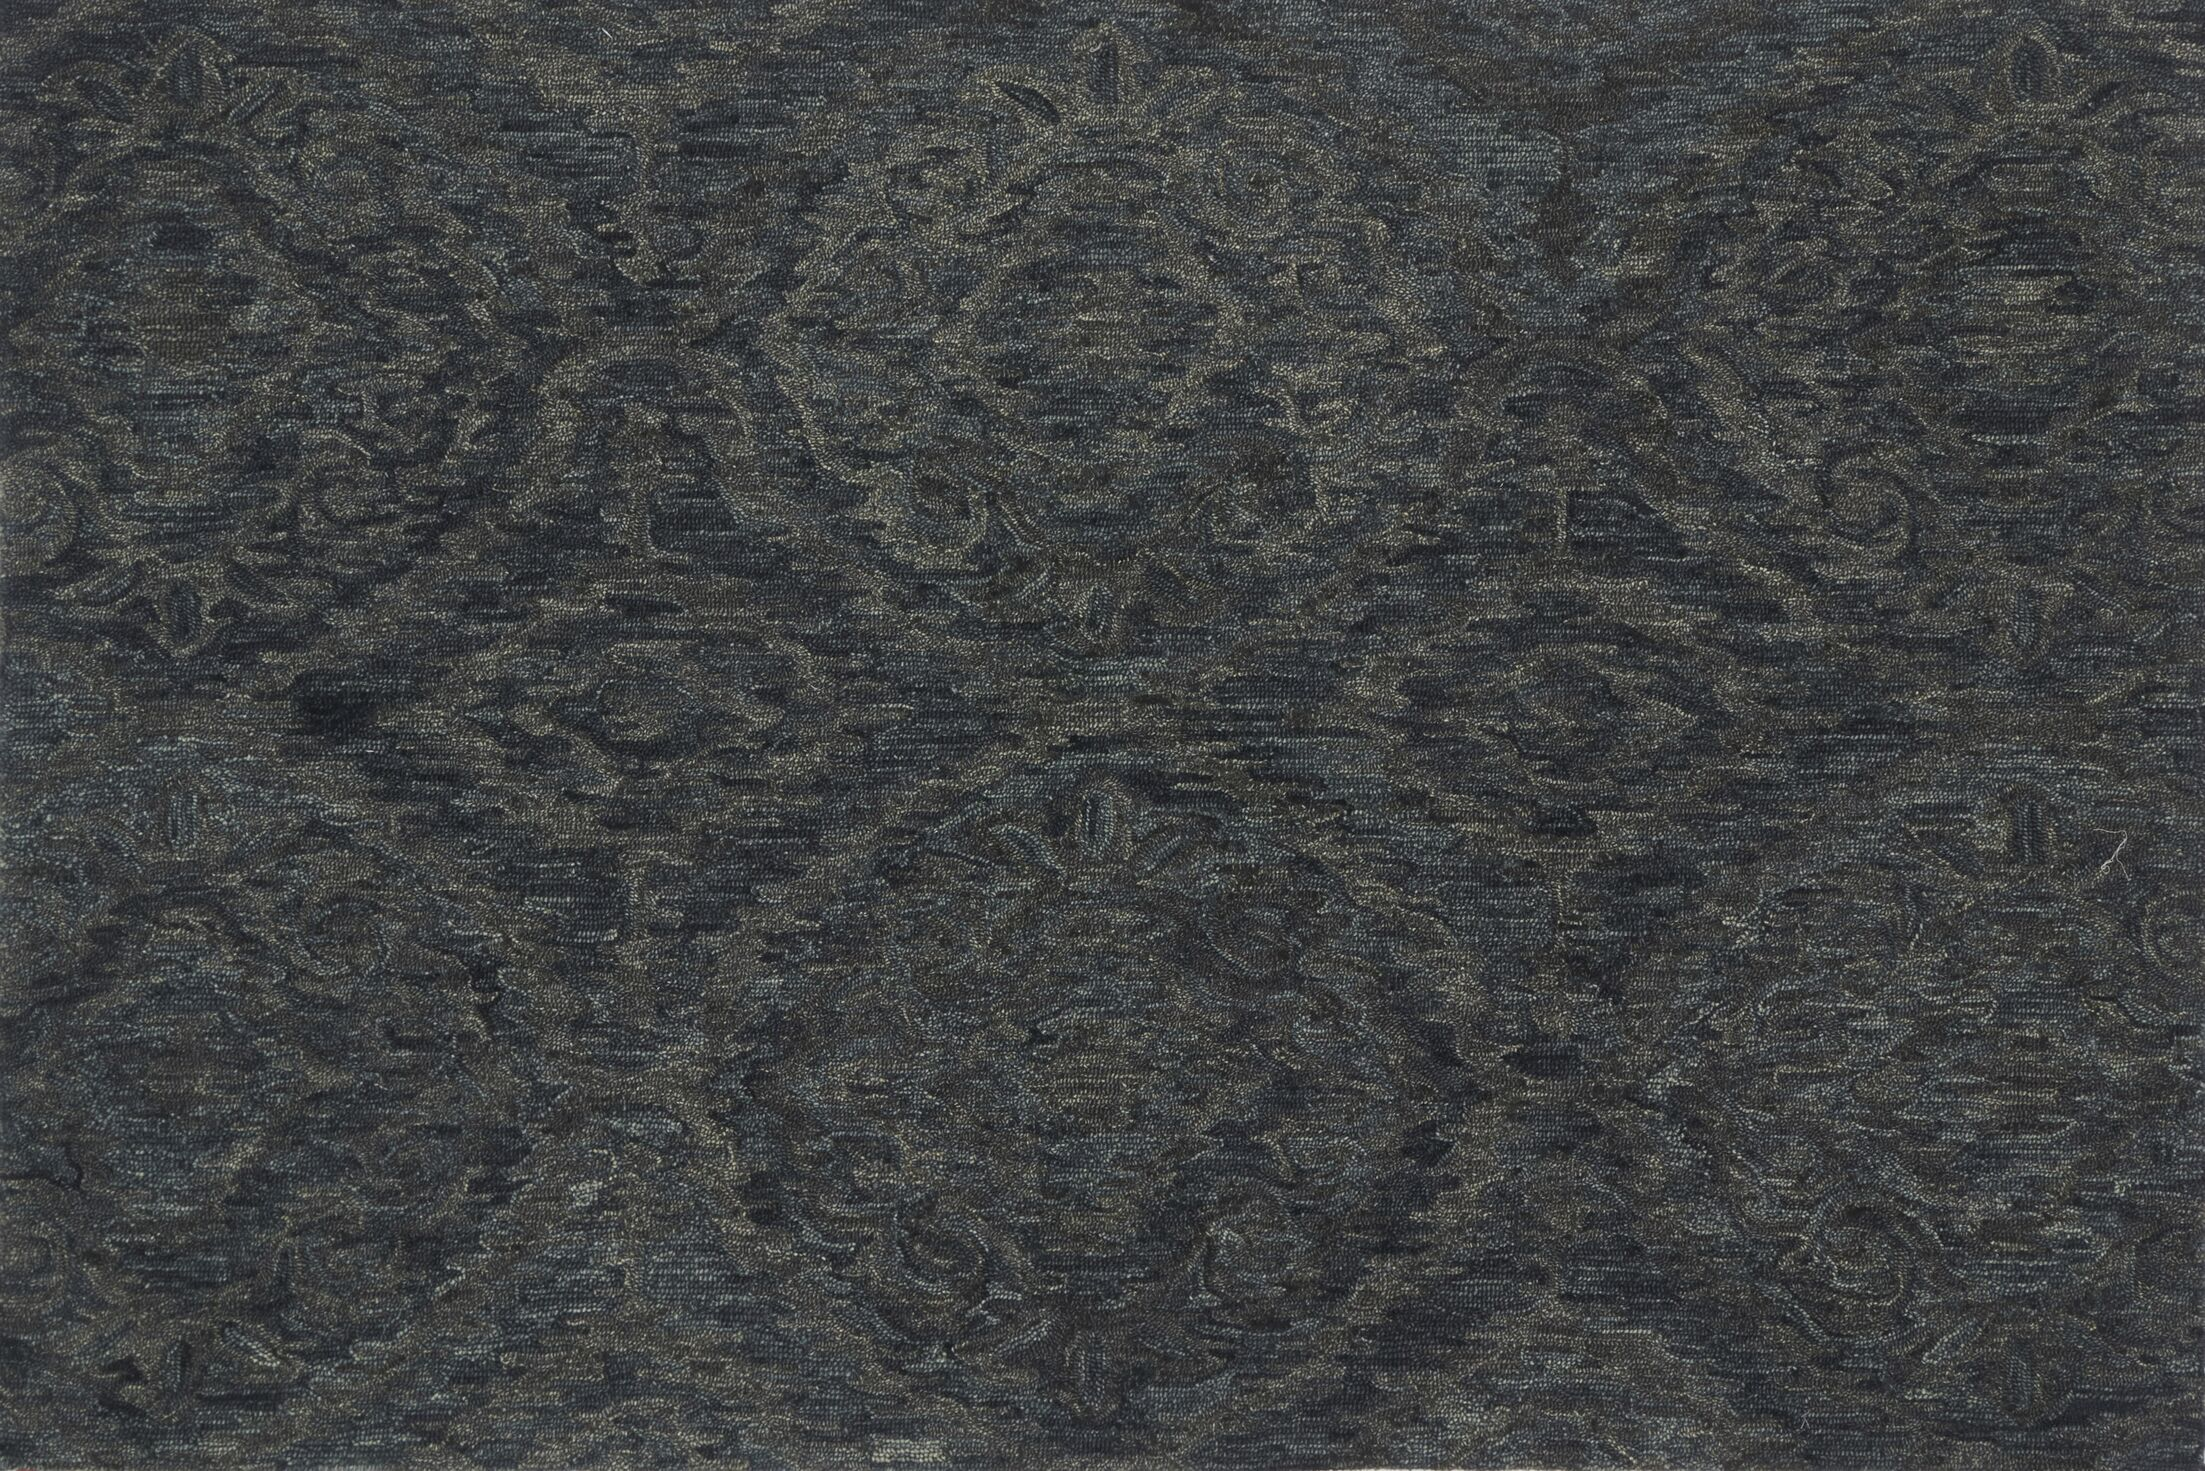 Cherrelle Hand-Hooked Wool Ink Area Rug Rug Size: Rectangle 3'6